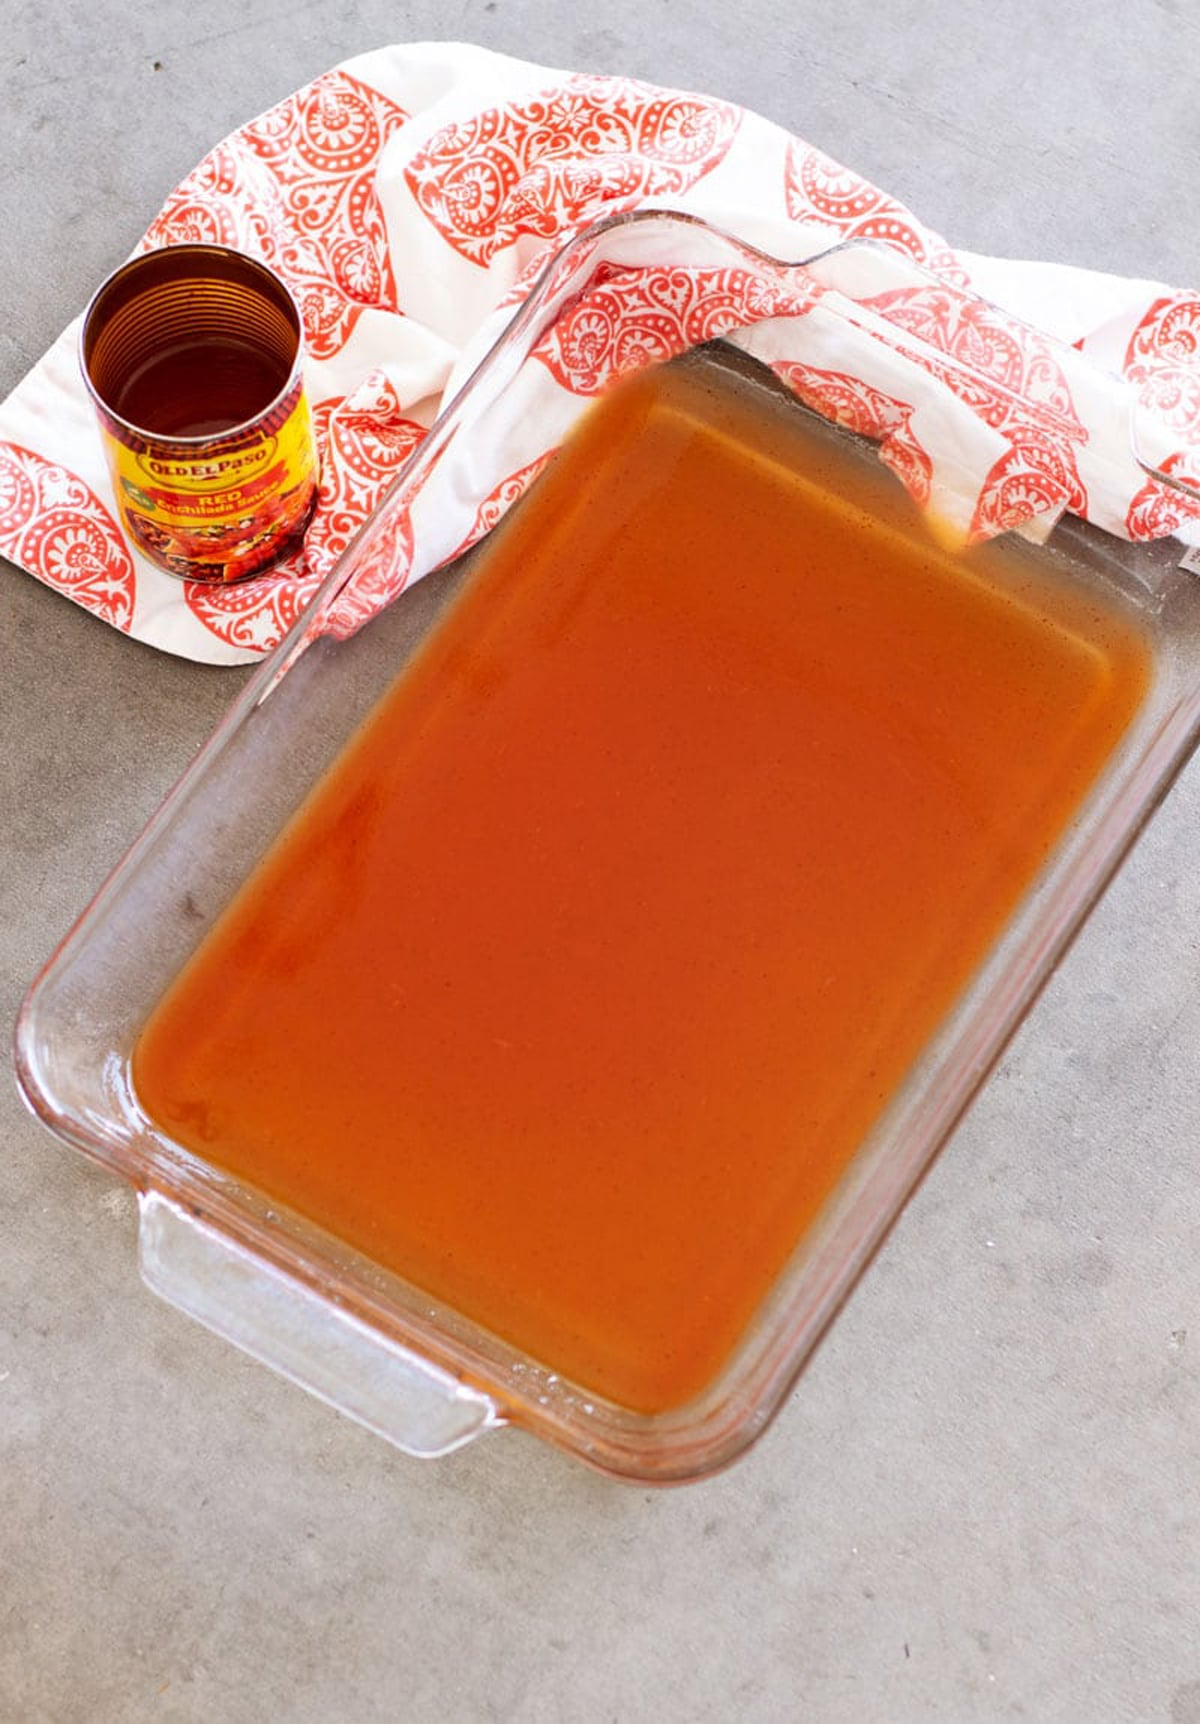 Glass casserole dish containing enchilada sauce.